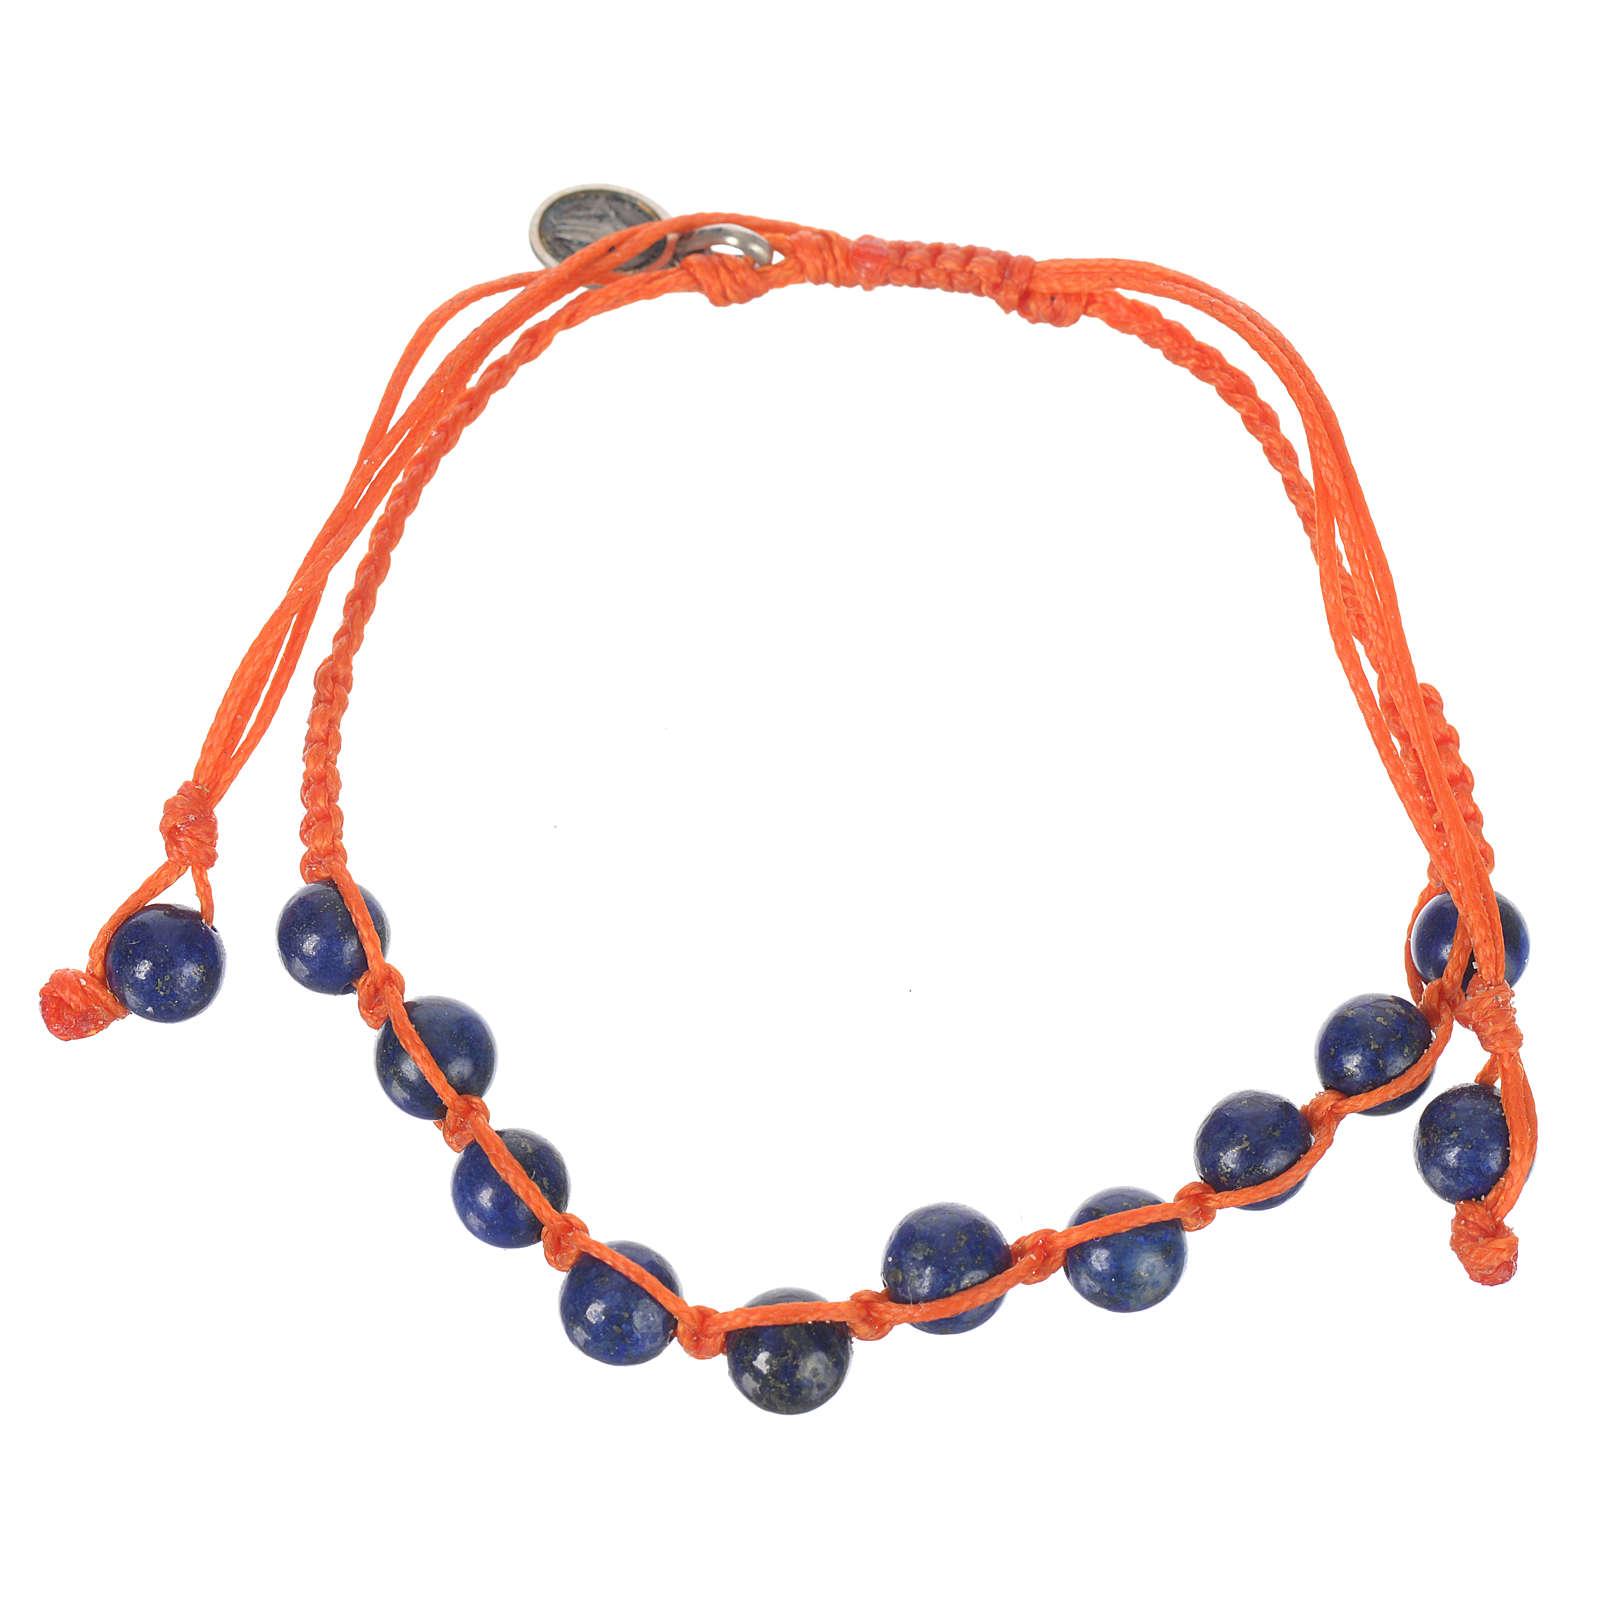 Bracelet Lapis-Lazuli Méd. Miraculeuse Arg 925 cordon orange 4